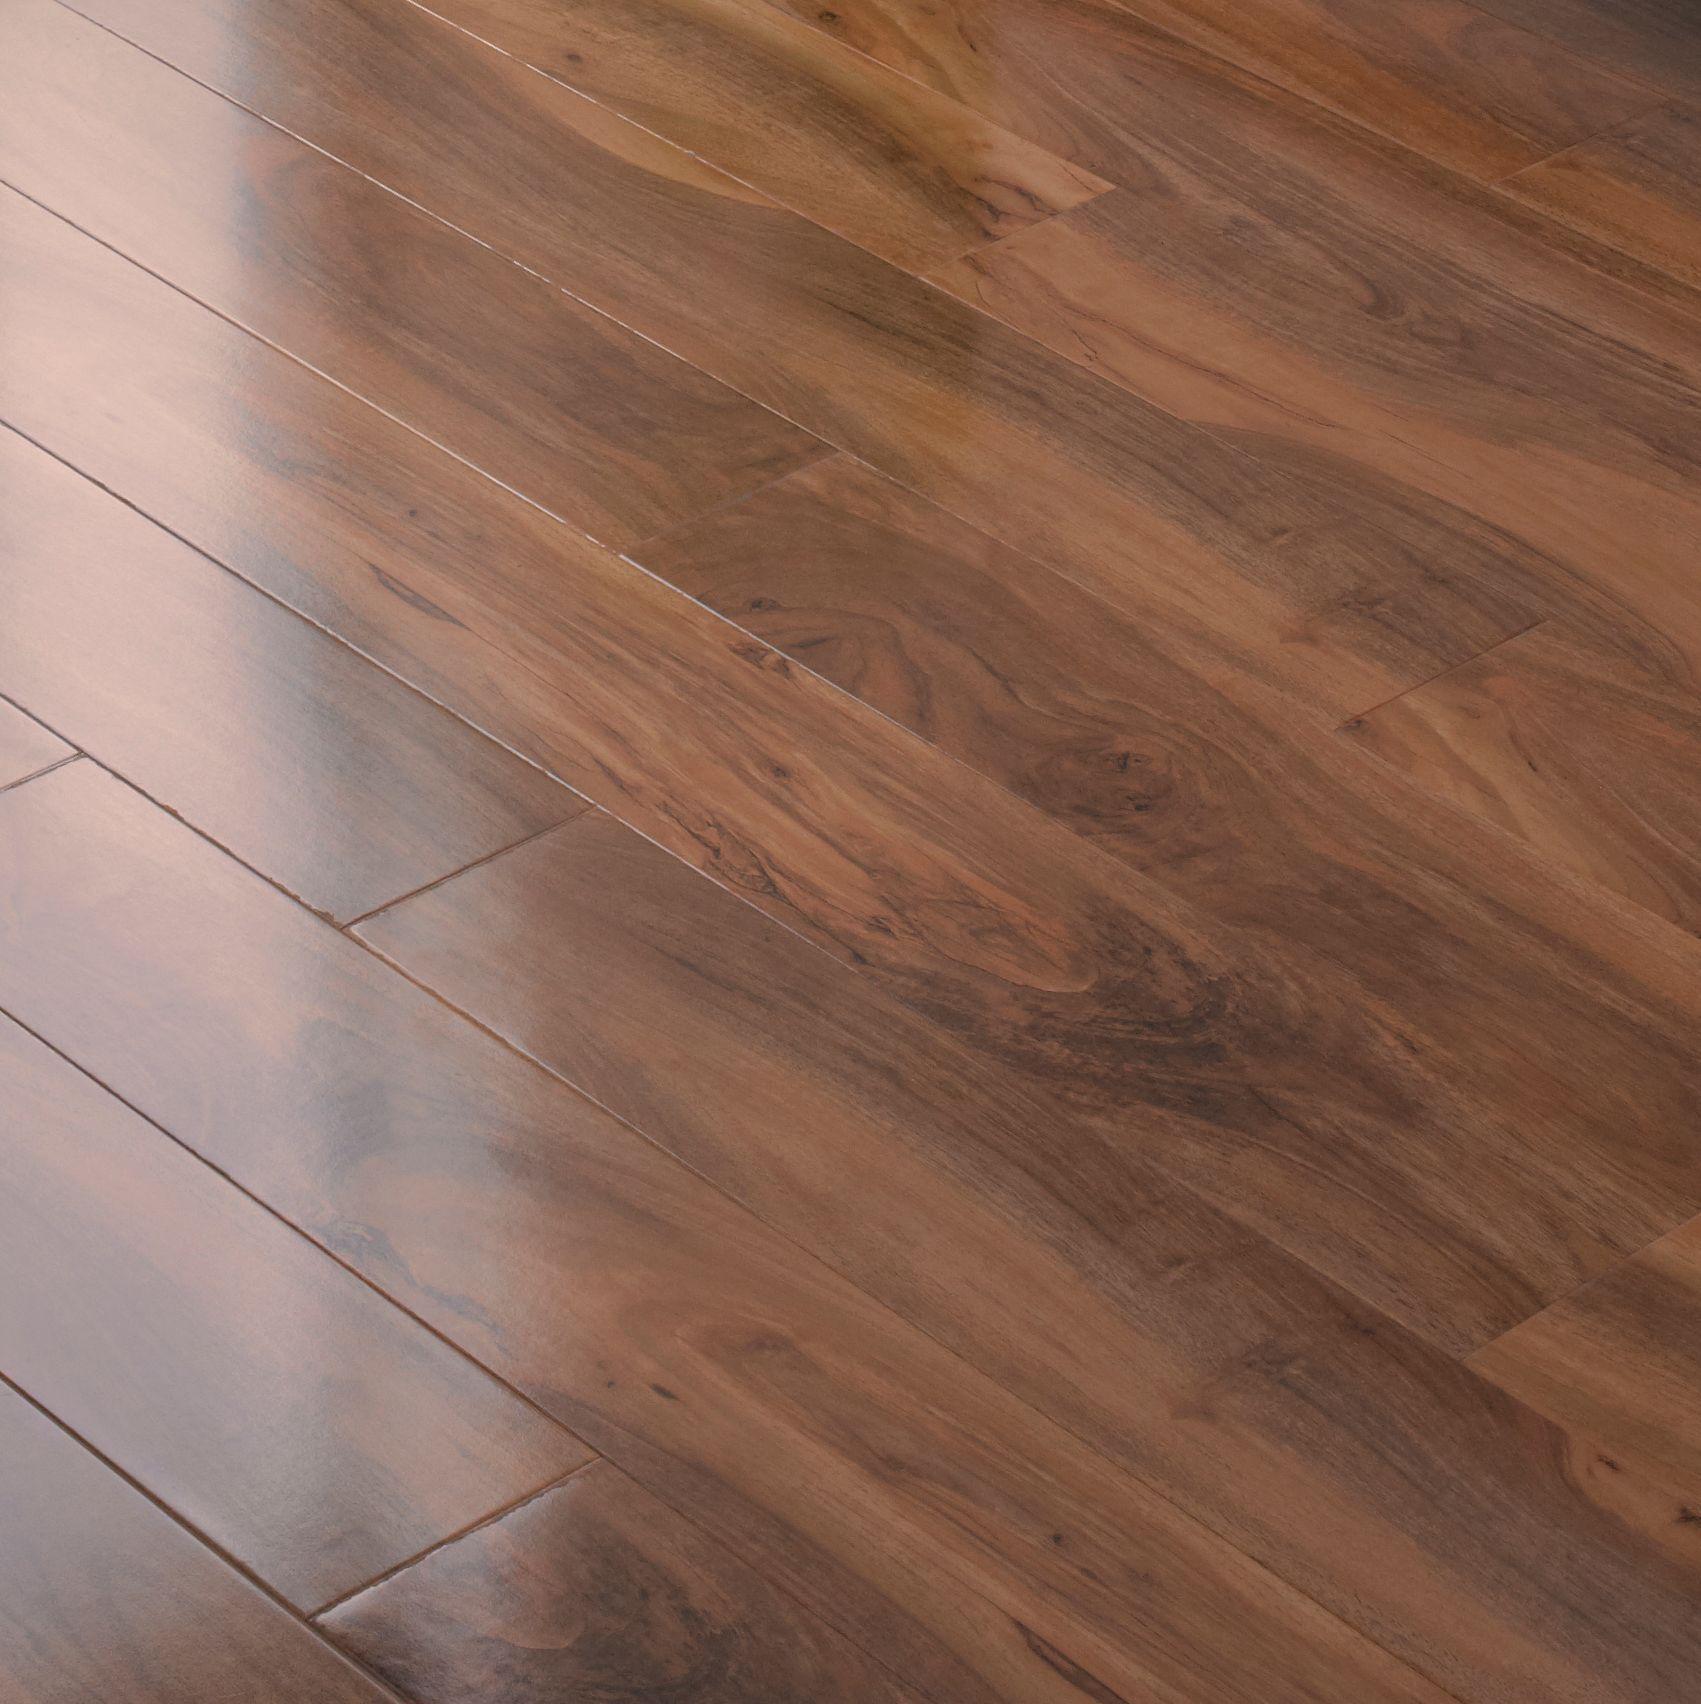 Dolce Natural Walnut Effect Laminate Flooring 0 04 M Sample Departments Diy At B Q Laminate Flooring Laminate Flooring Diy Flooring